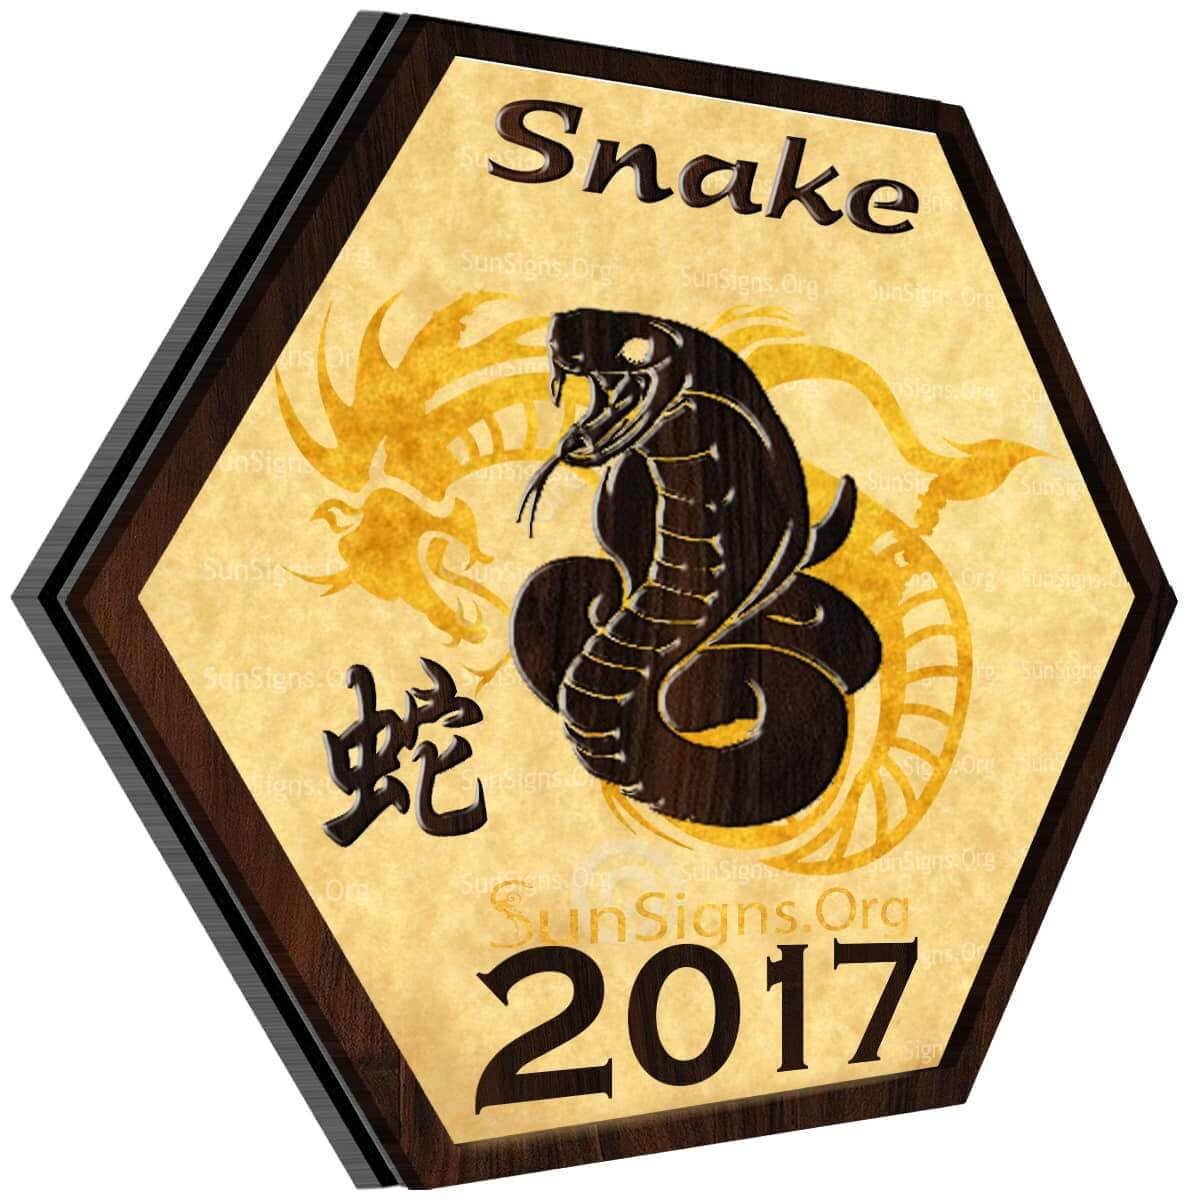 Snake horoscope 2017 predictions sun signs snake horoscope 2017 buycottarizona